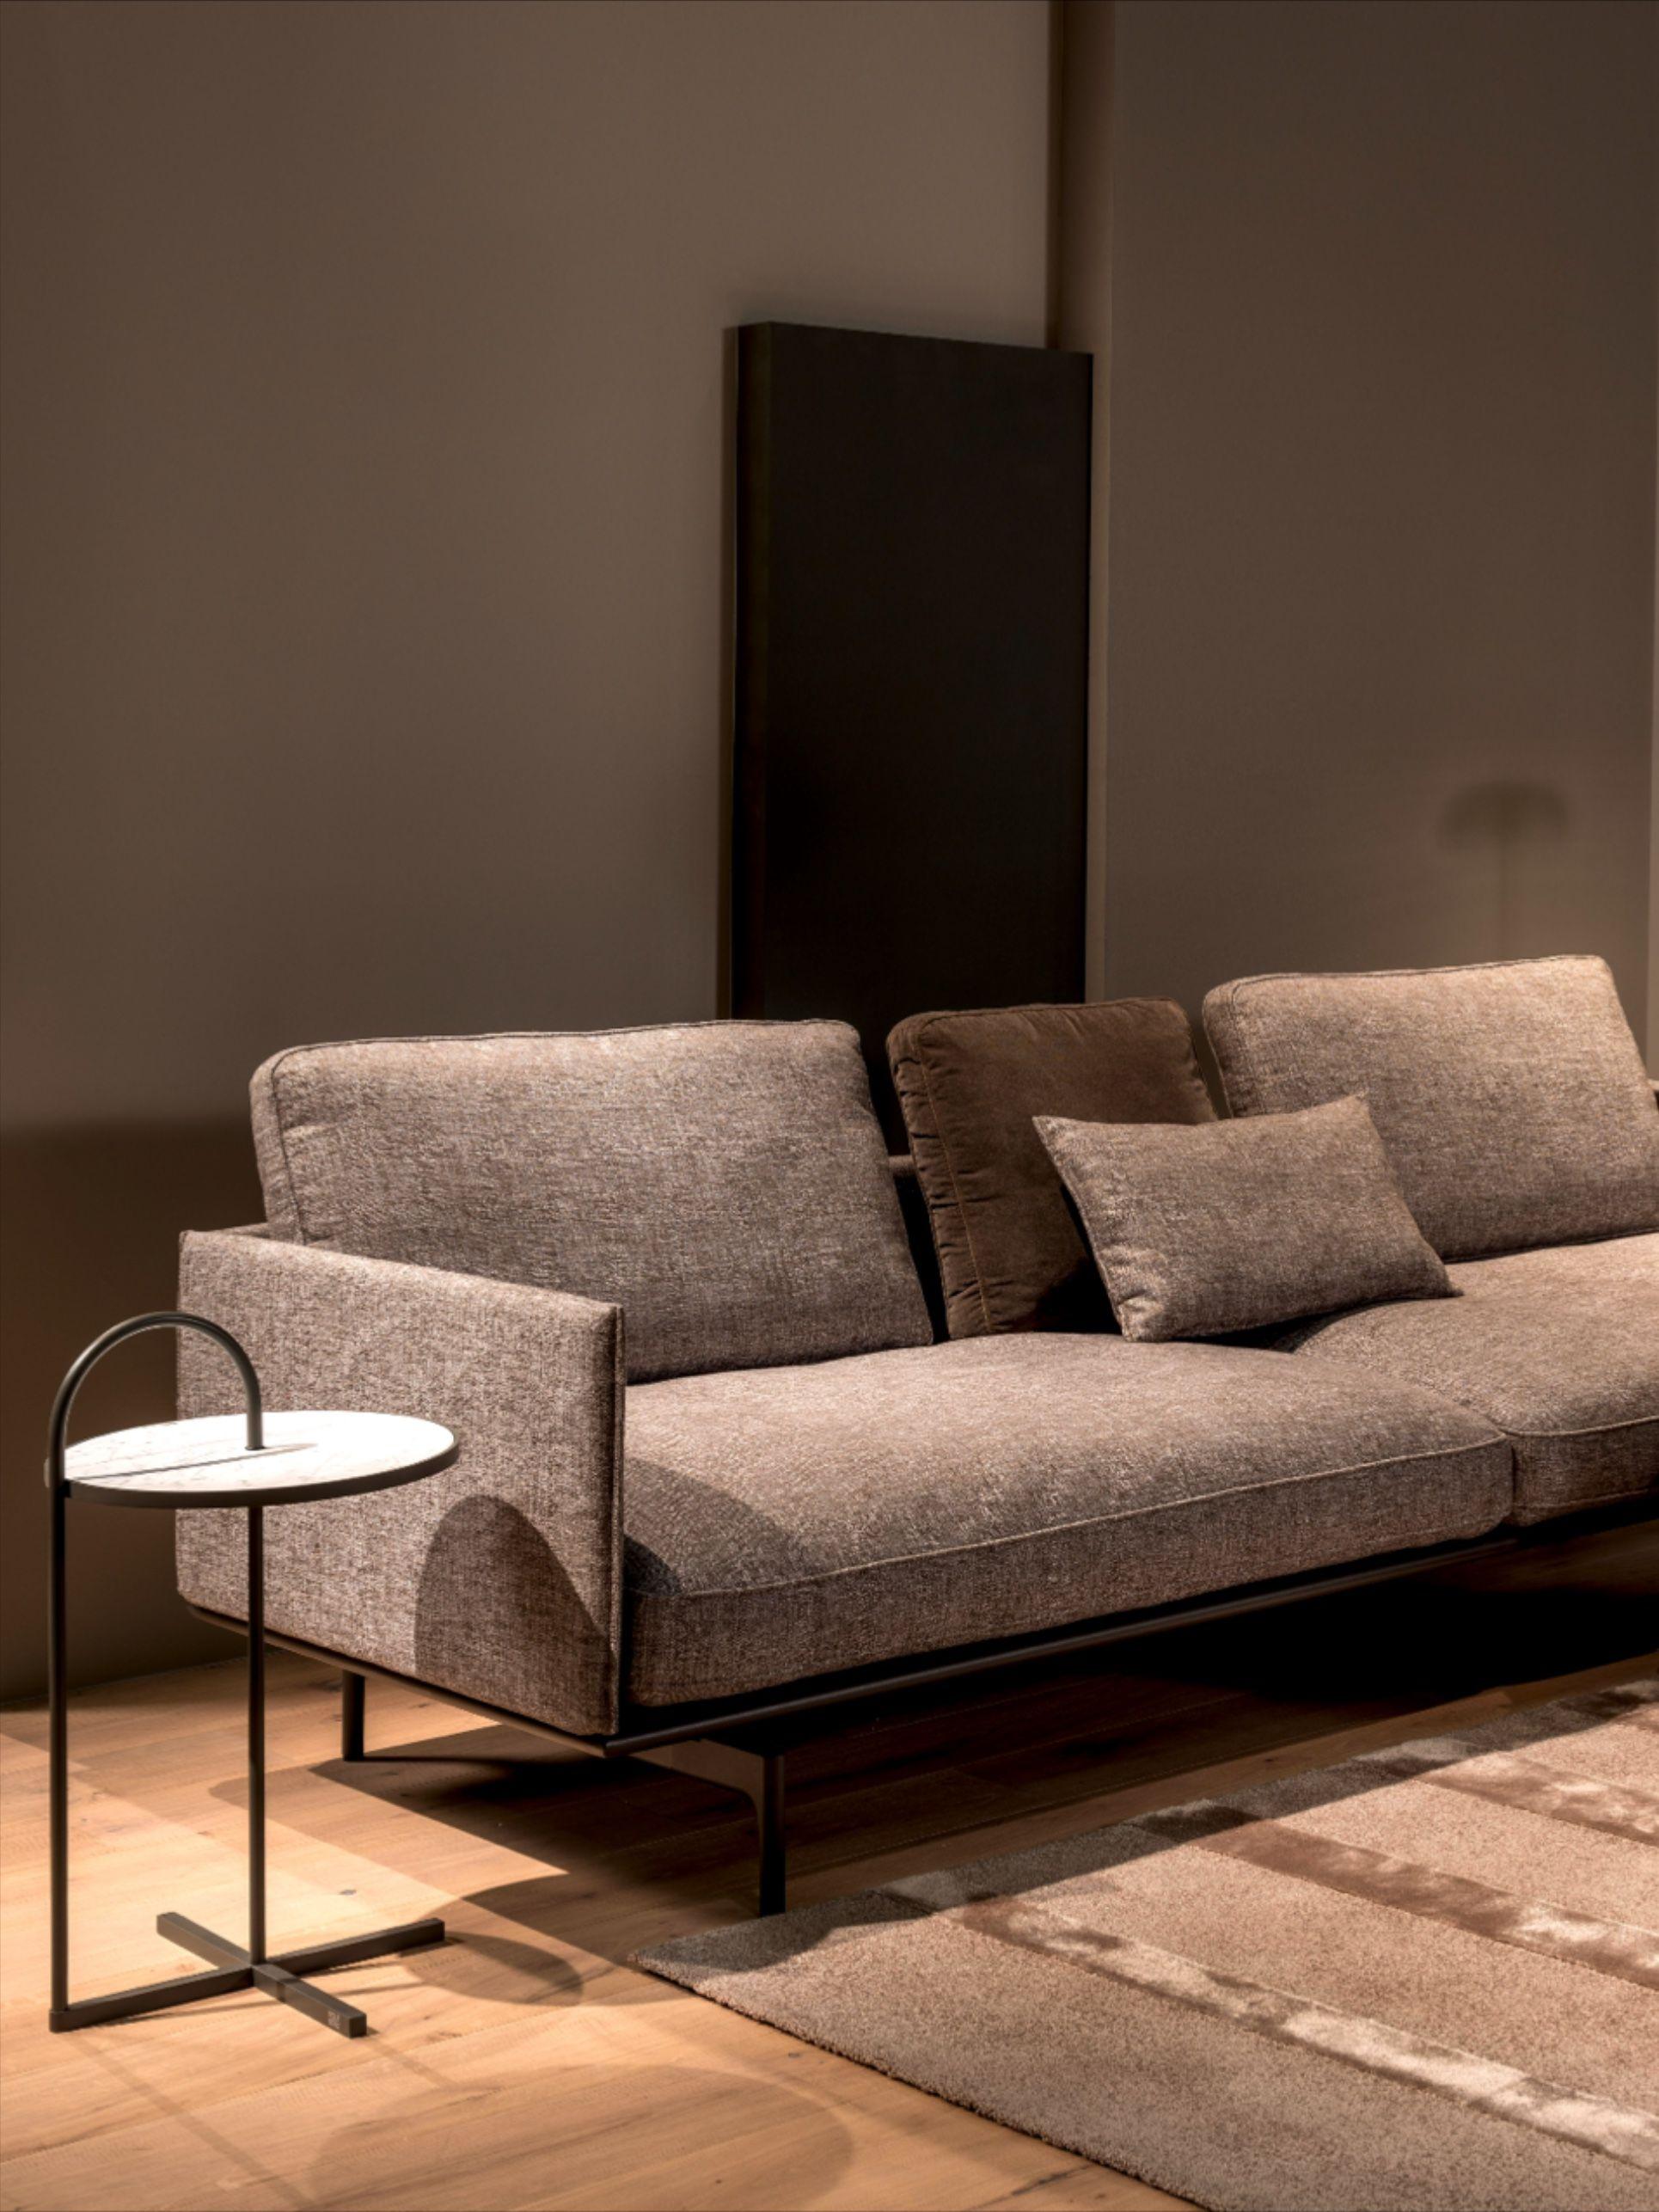 Rolf Benz Imm Cologne 2020 In 2020 Furniture Love Seat Design